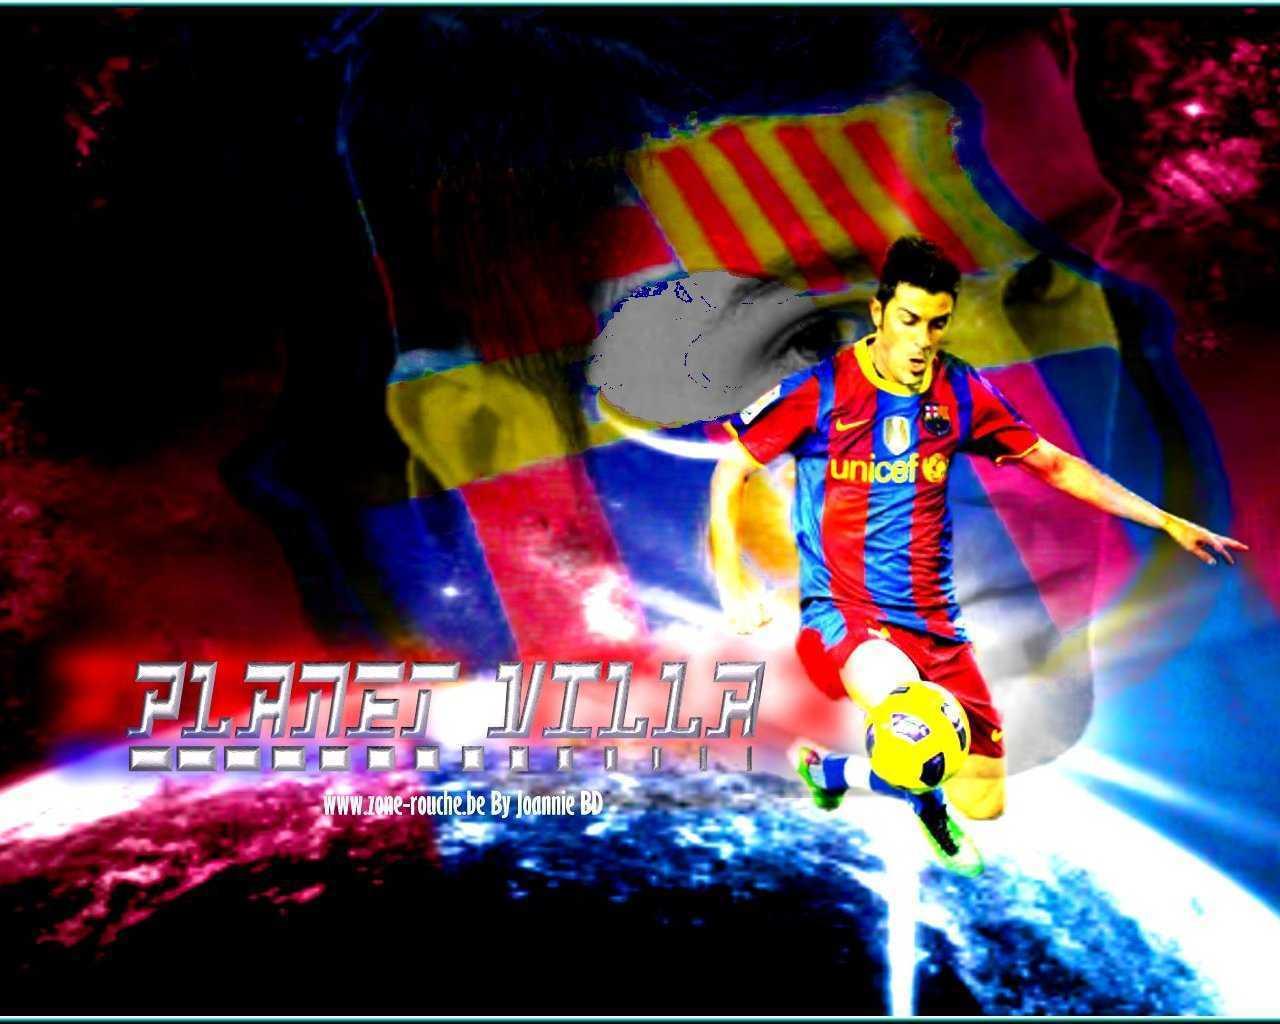 http://images4.fanpop.com/image/photos/22500000/David-Villa-FC-Barcelona-Wallpaper-david-villa-22595117-1280-1024.jpg